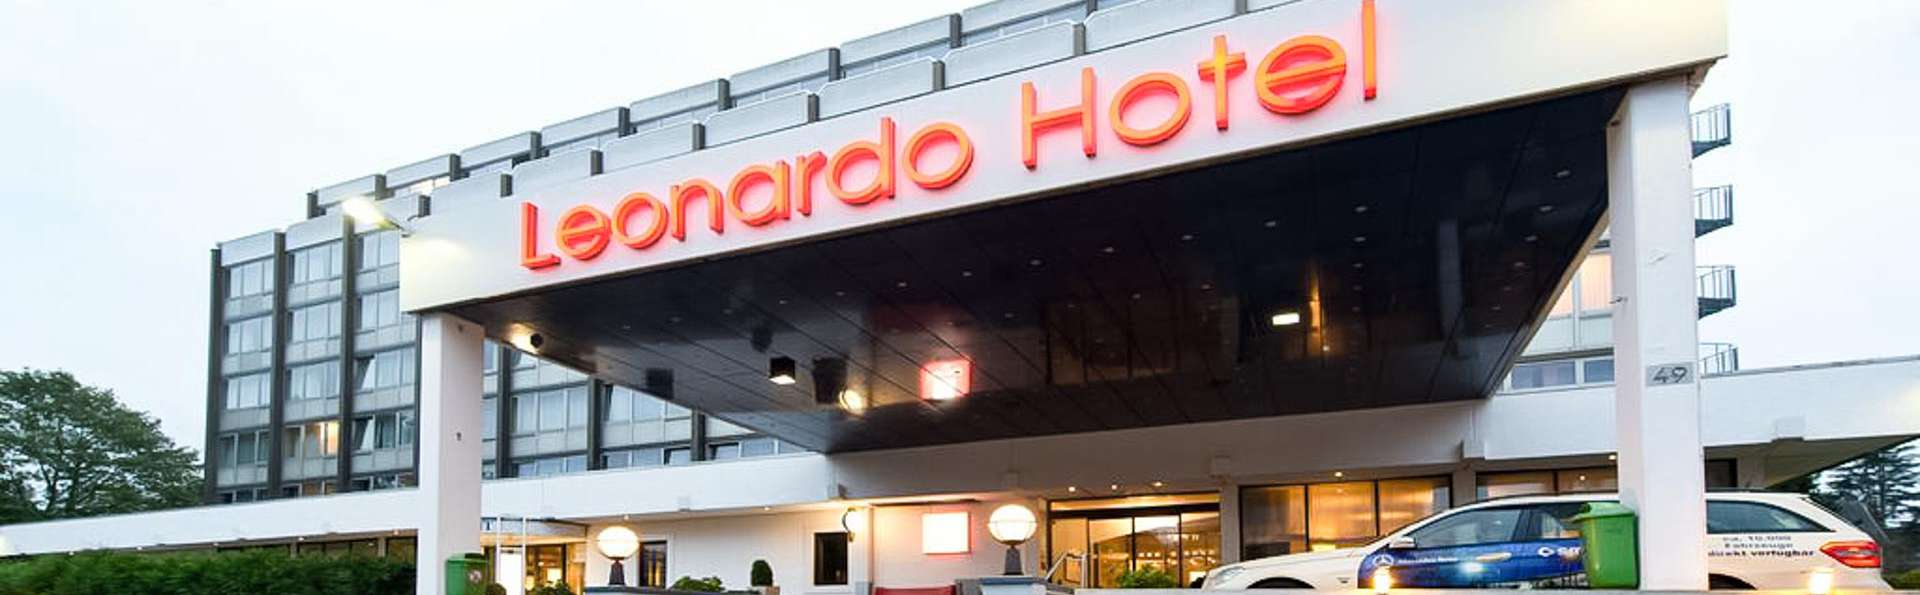 Leonardo Hotel Mönchengladbach - EDIT_FRONT_05.jpg